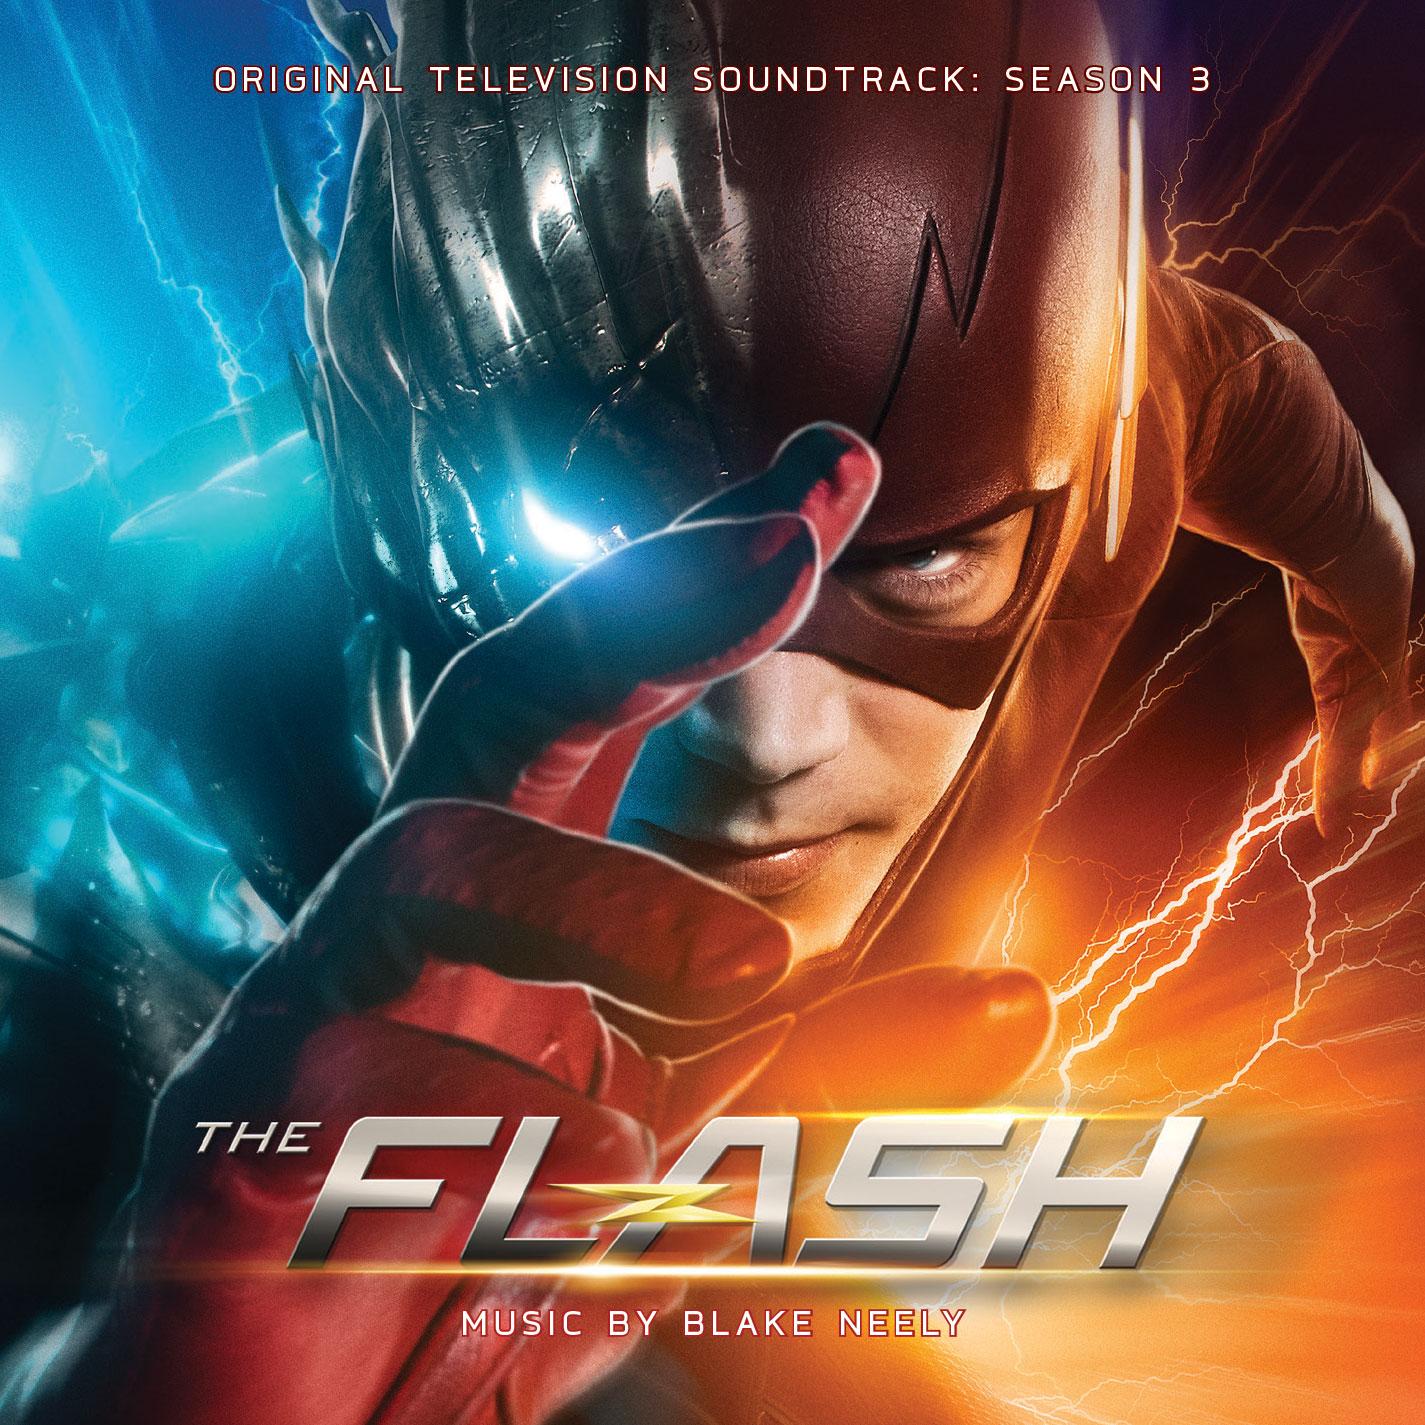 The Flash: Season 3, Detalles del álbum